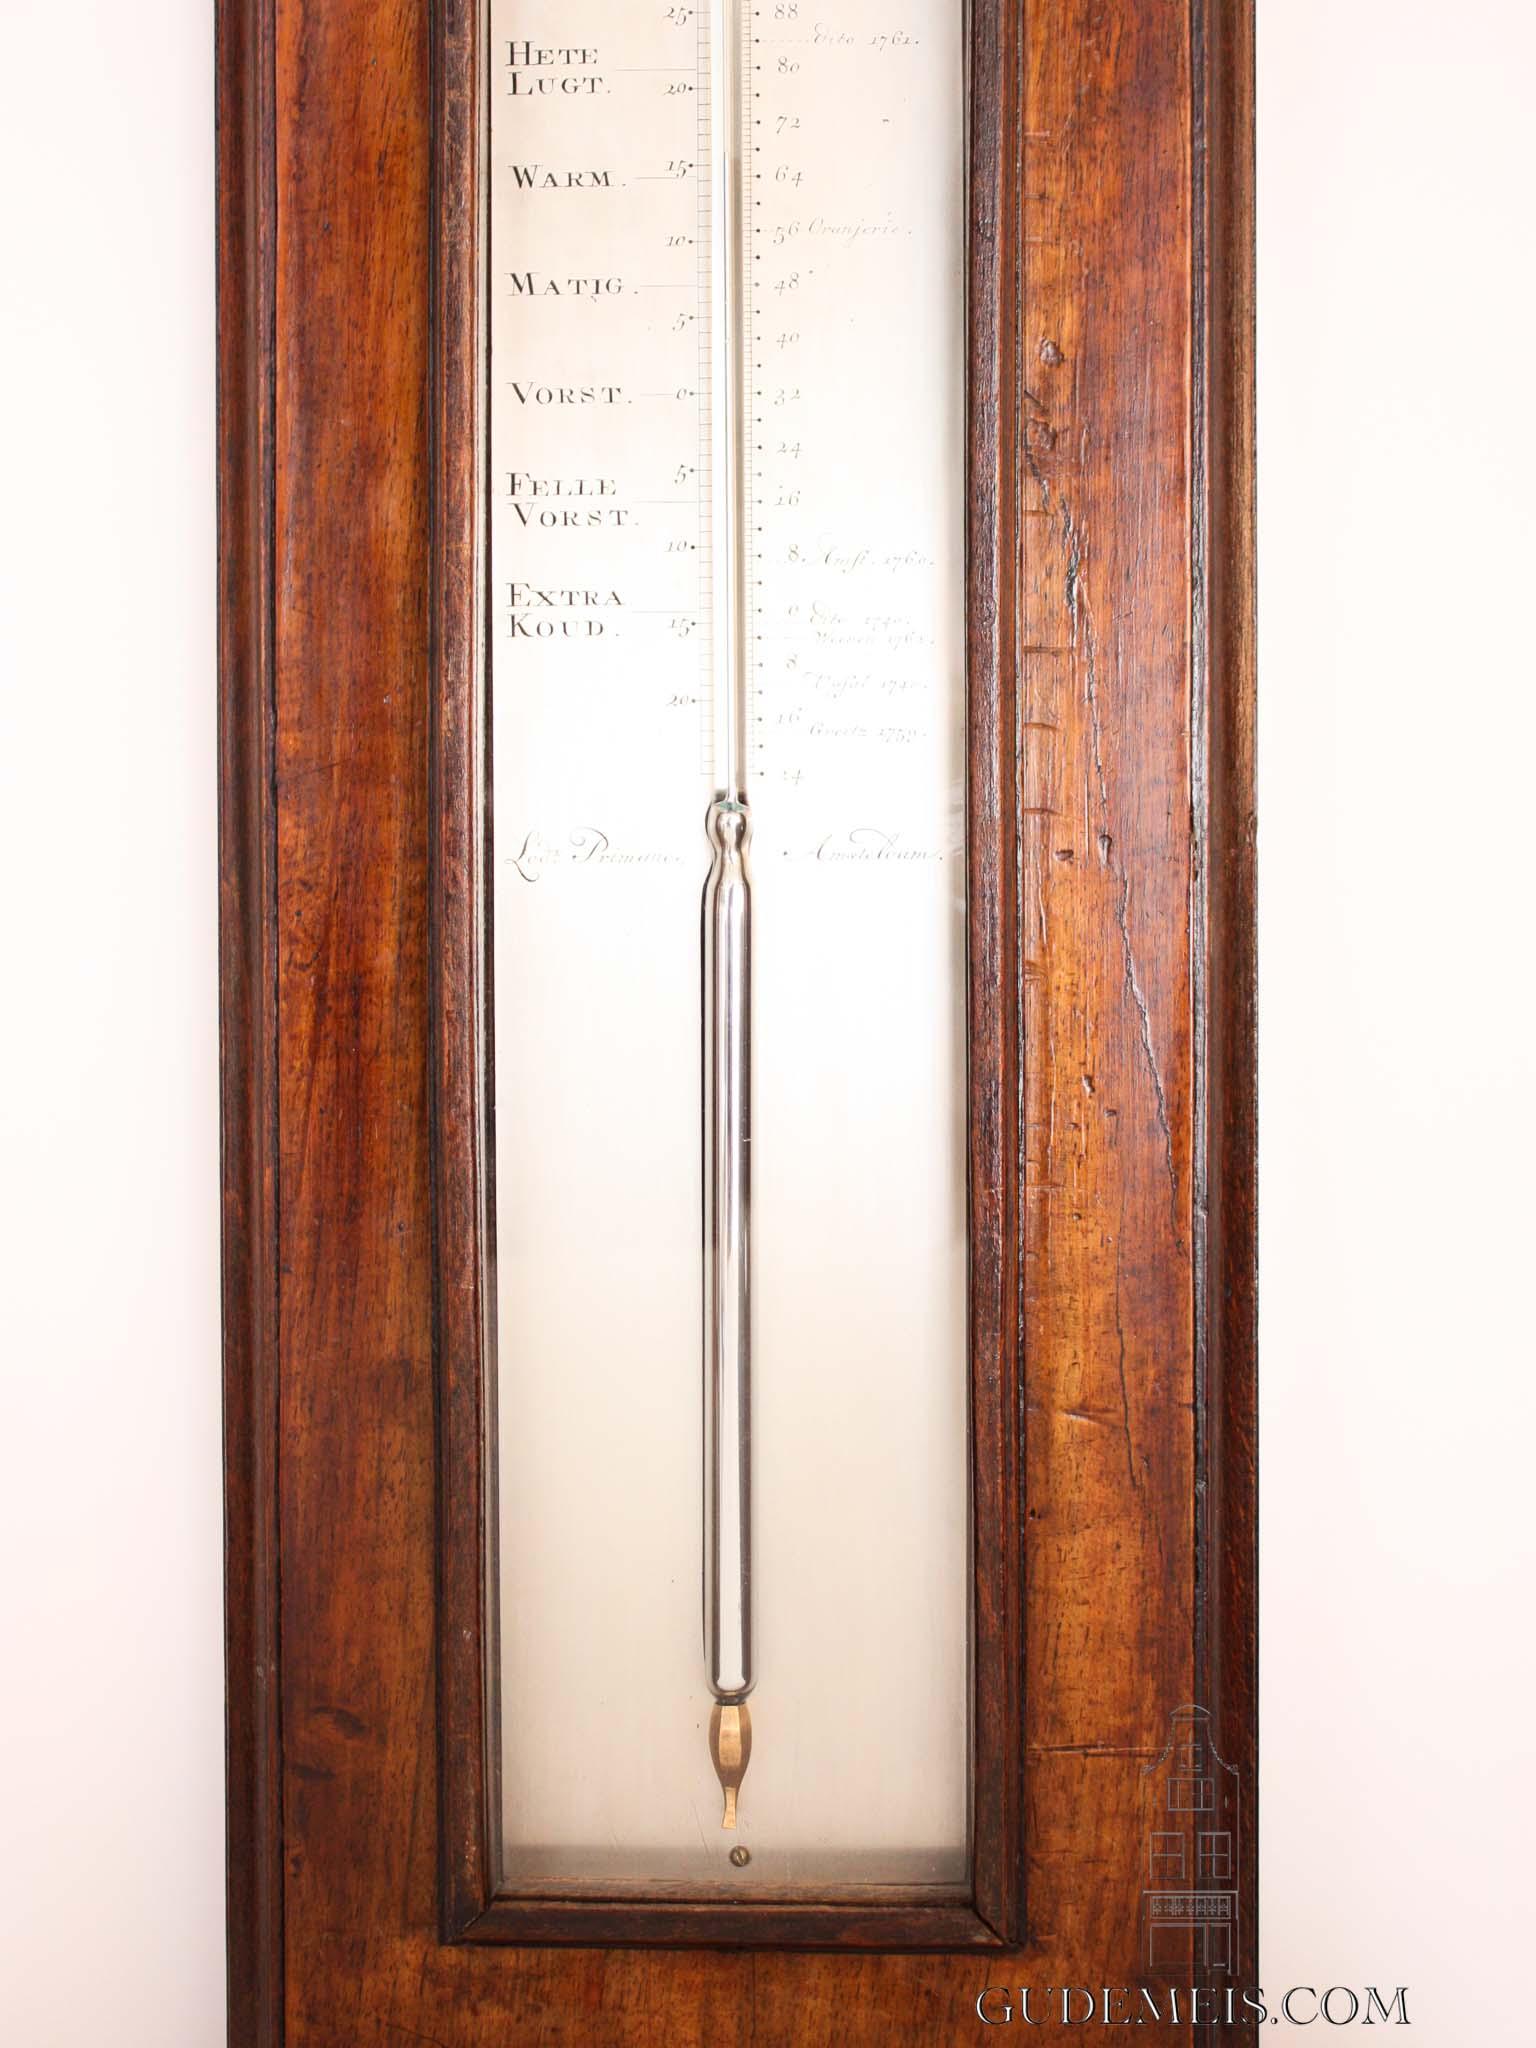 dutch-louisxv-mahogany-silvered-brass-plates-Amsterdam-wheel-barometer-primavesi-